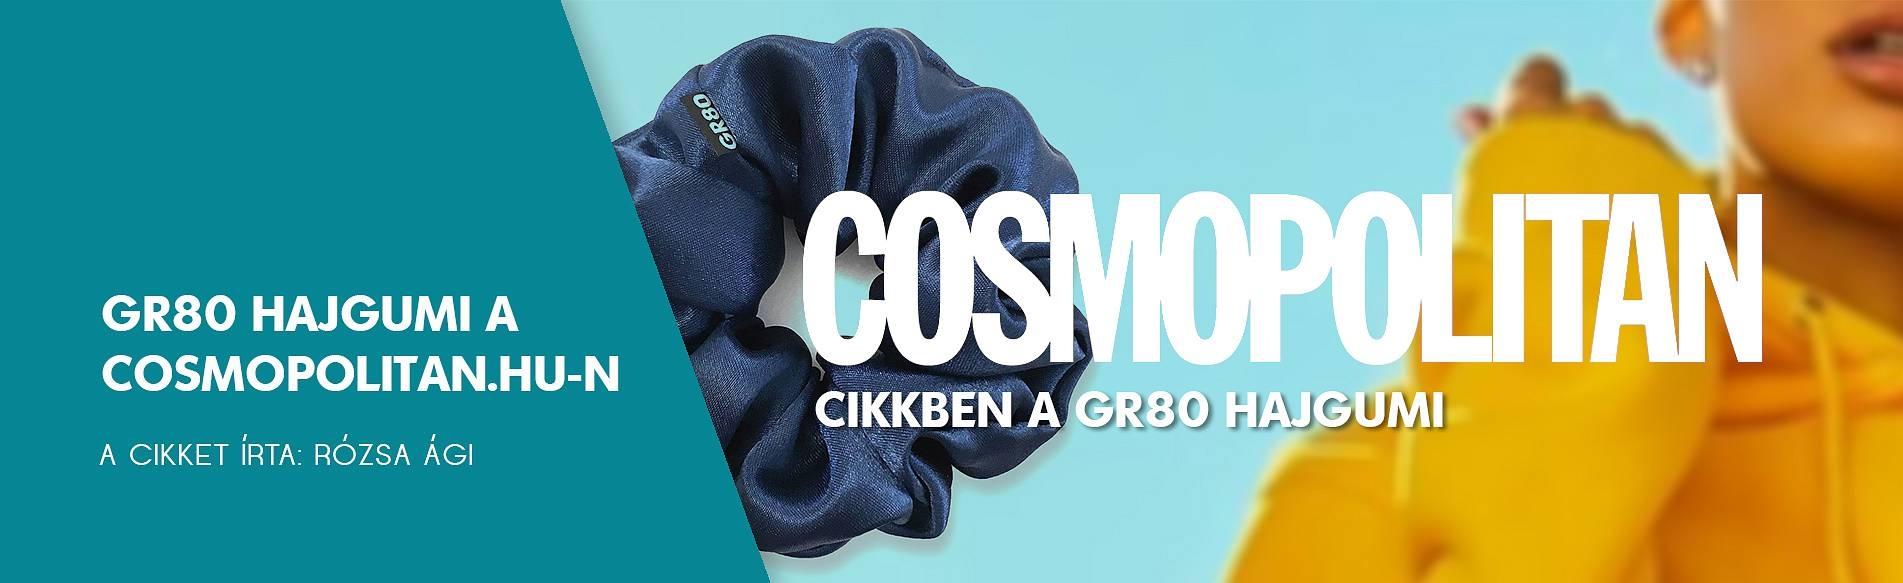 Cosmopolitan cikkben a GR80 hajgumi